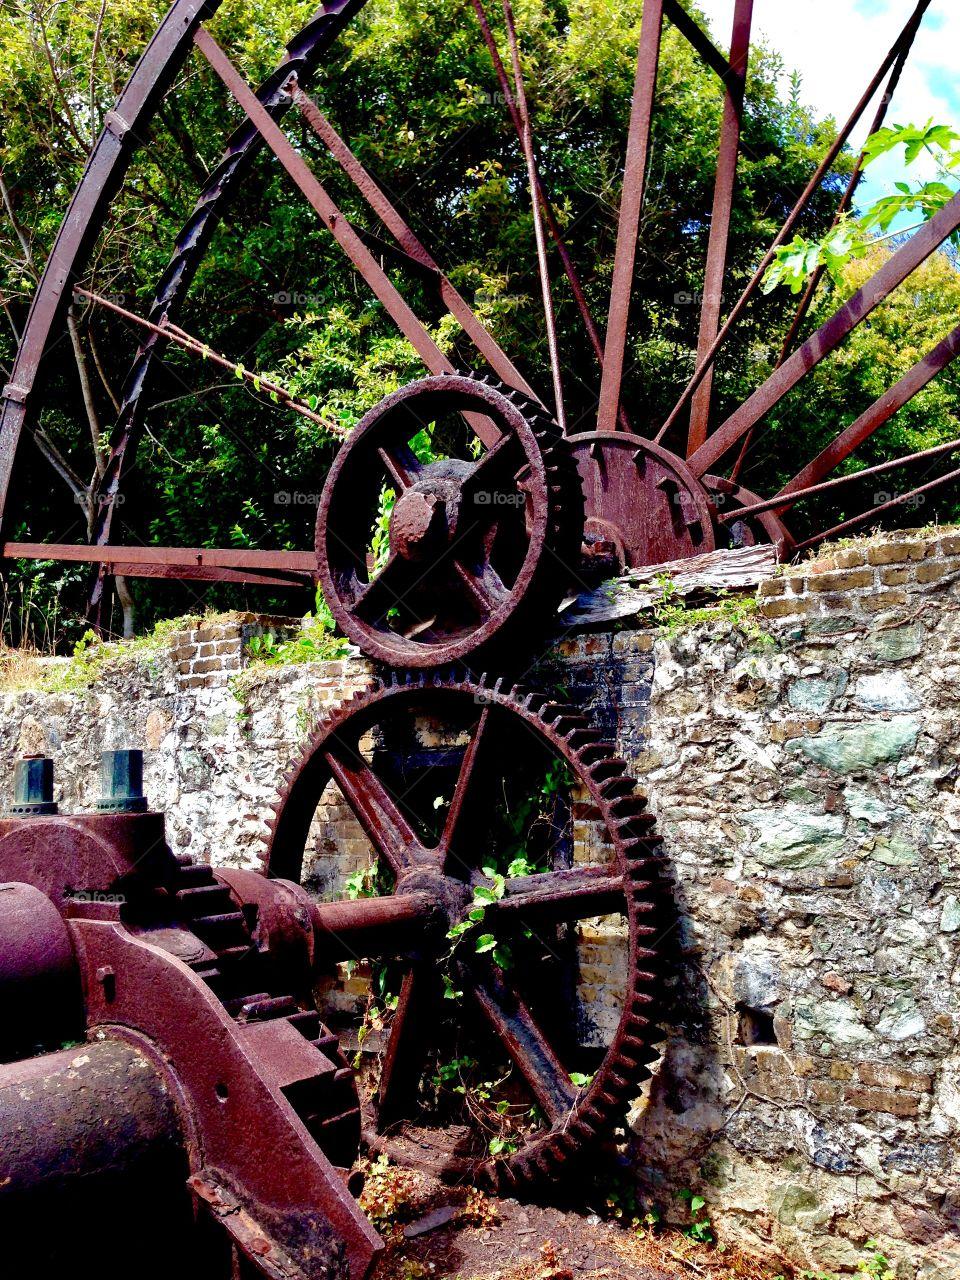 Historic Sugar Cane Mill